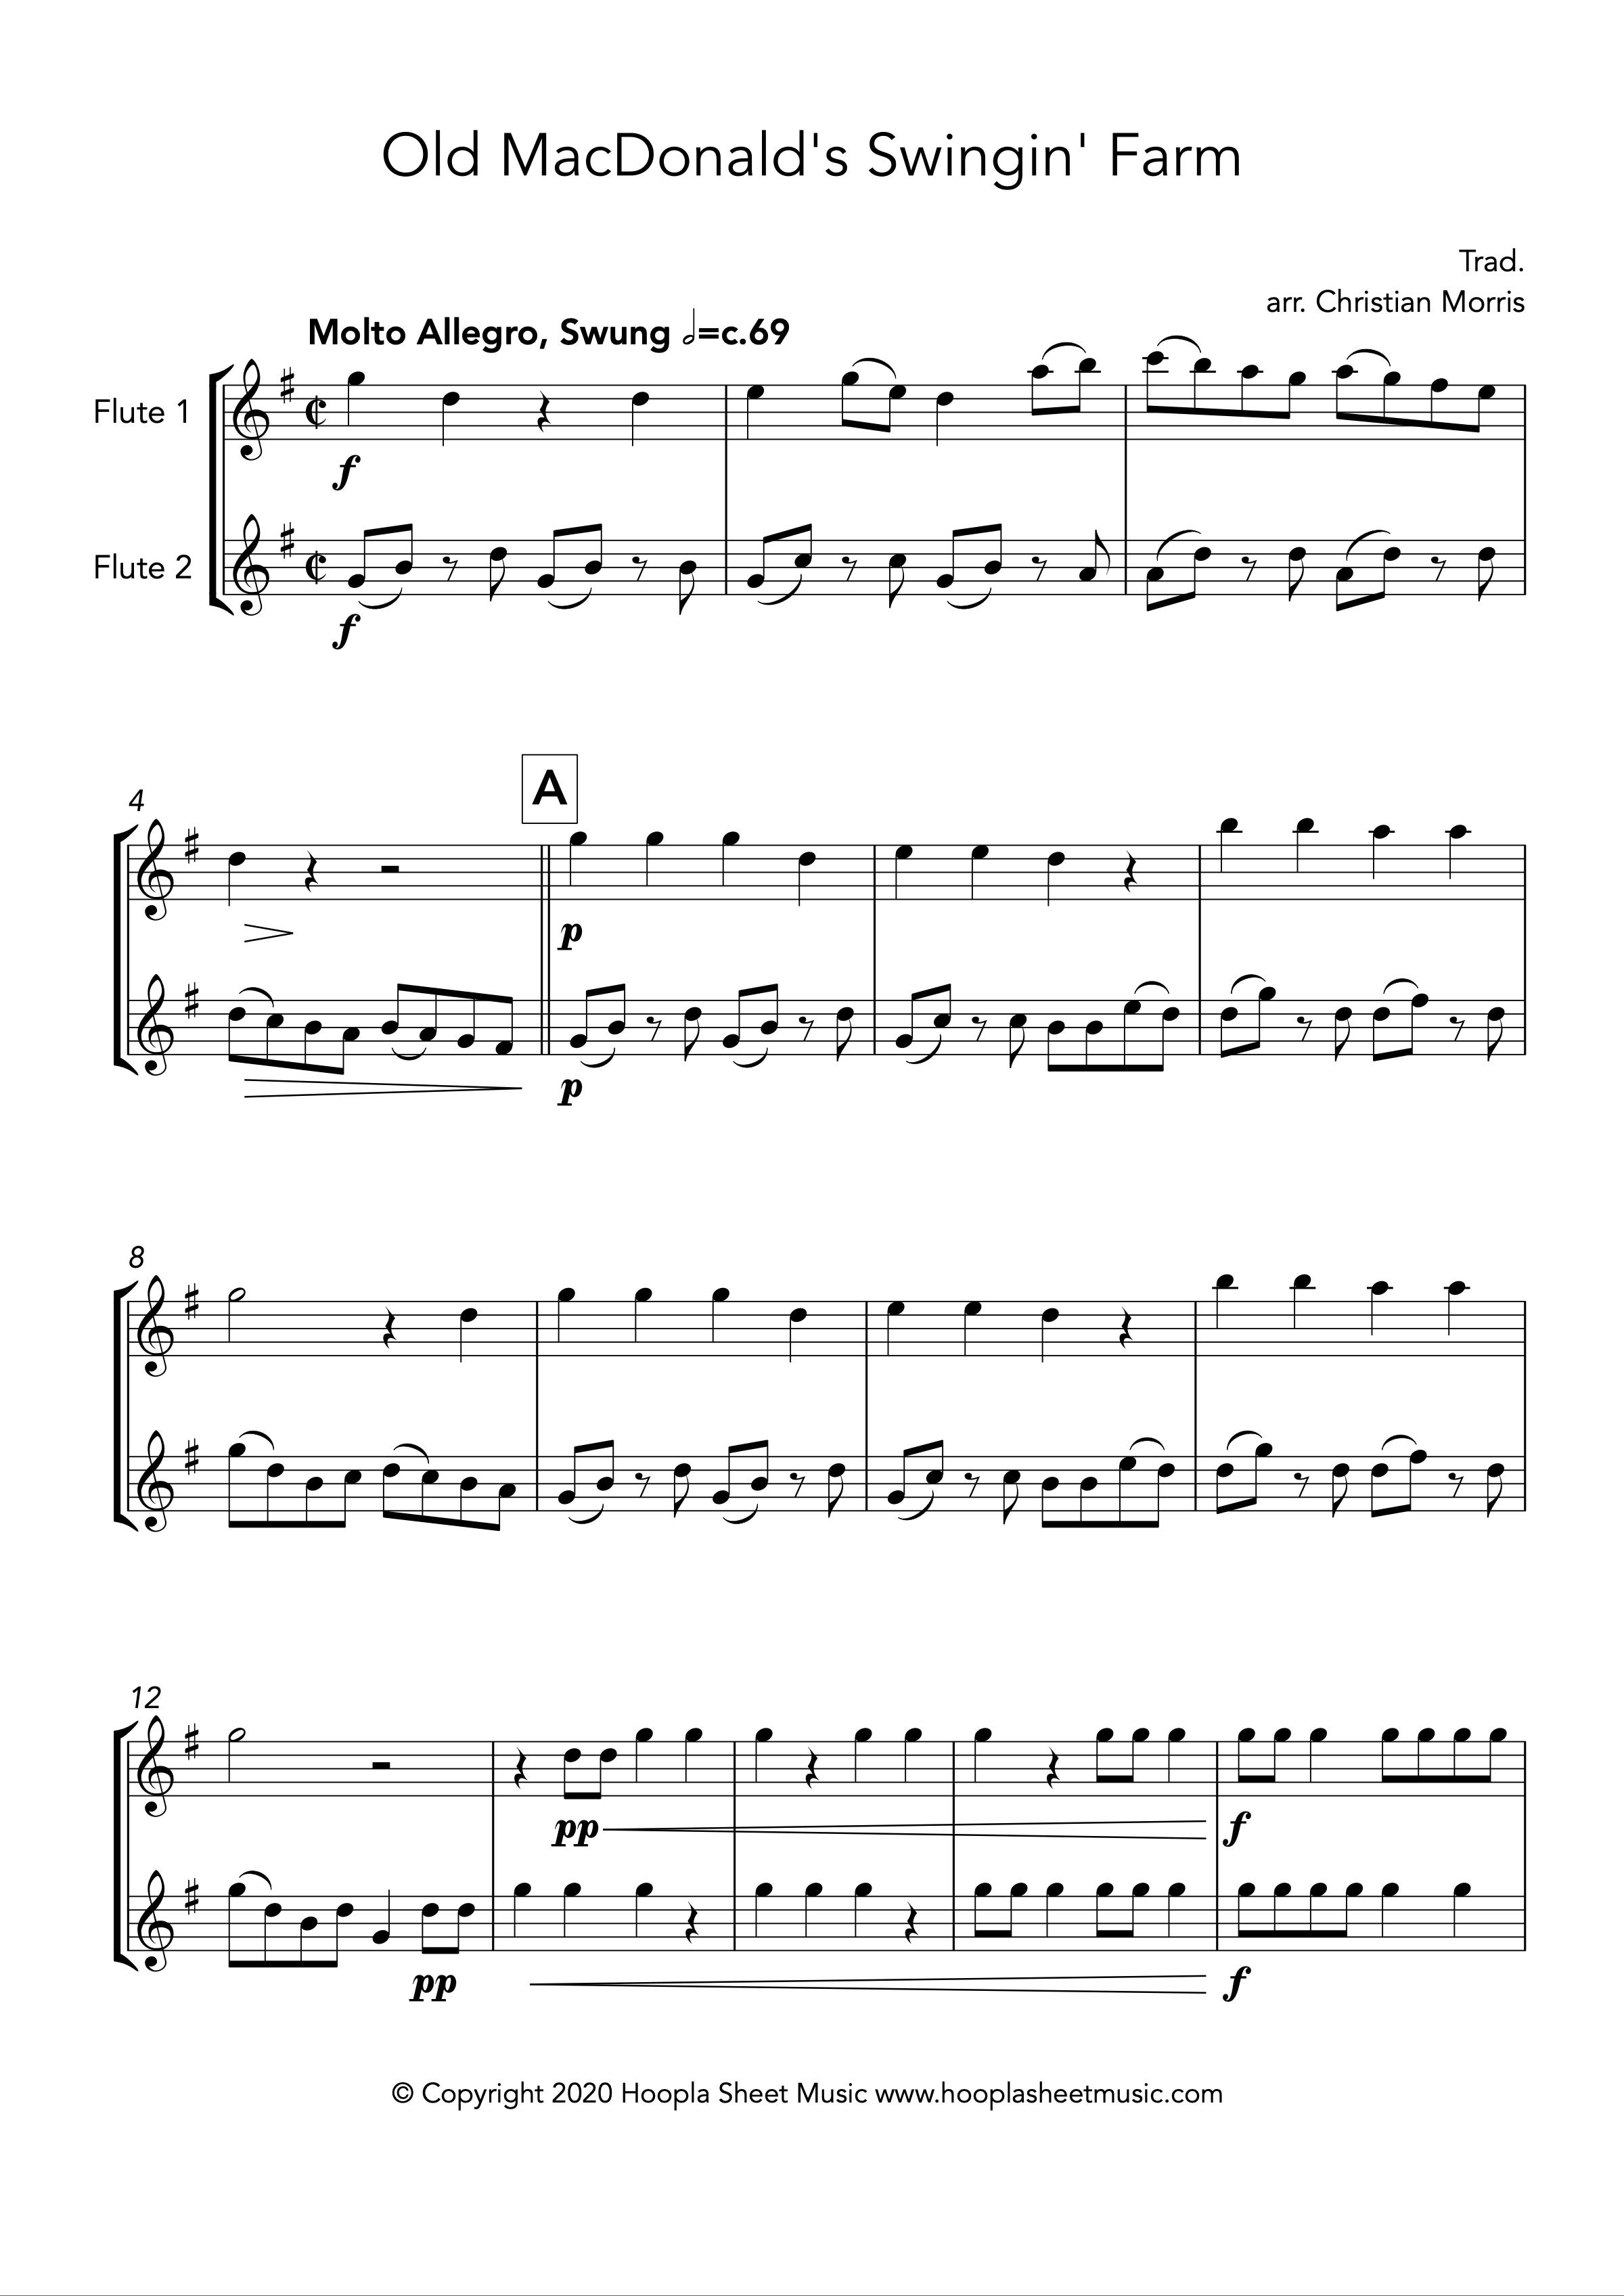 Old MacDonald's Swingin' Farm (Flute Duet)